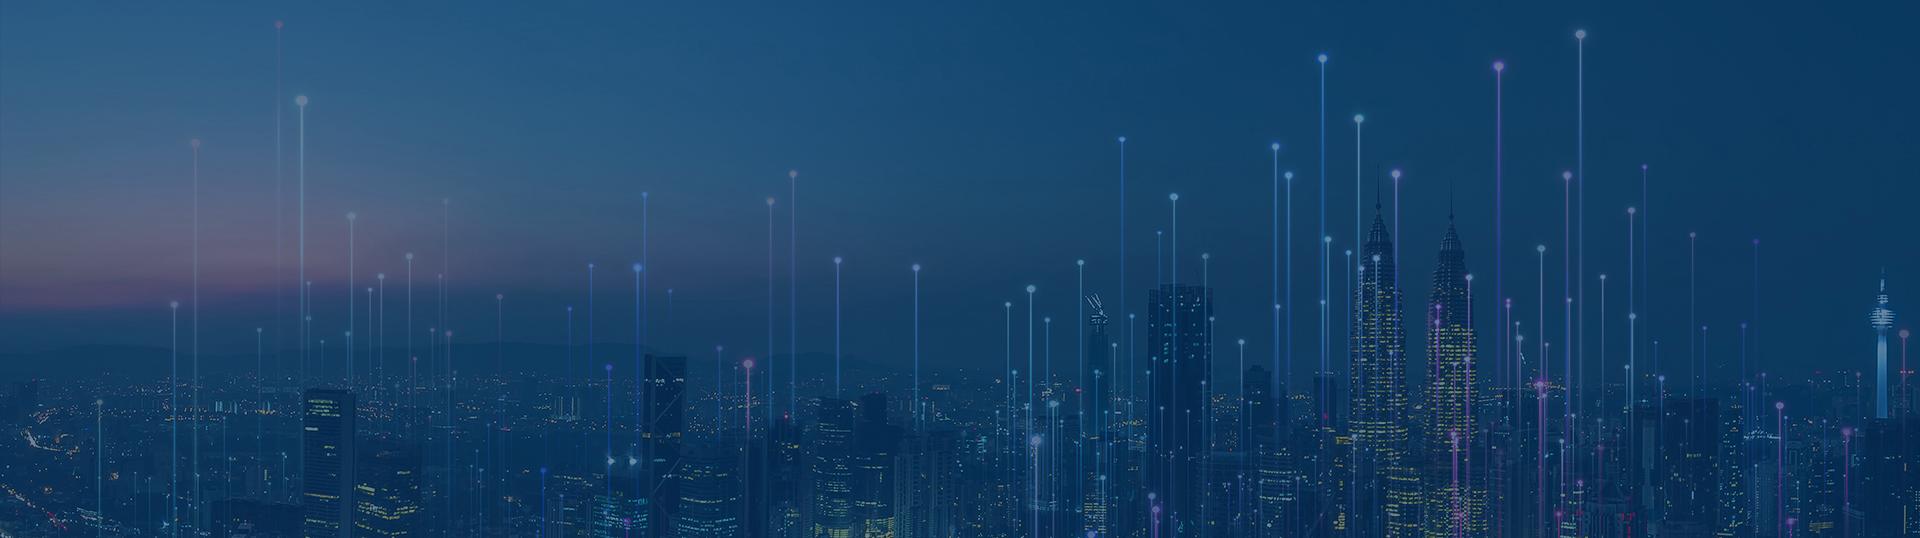 Smart-City-Background